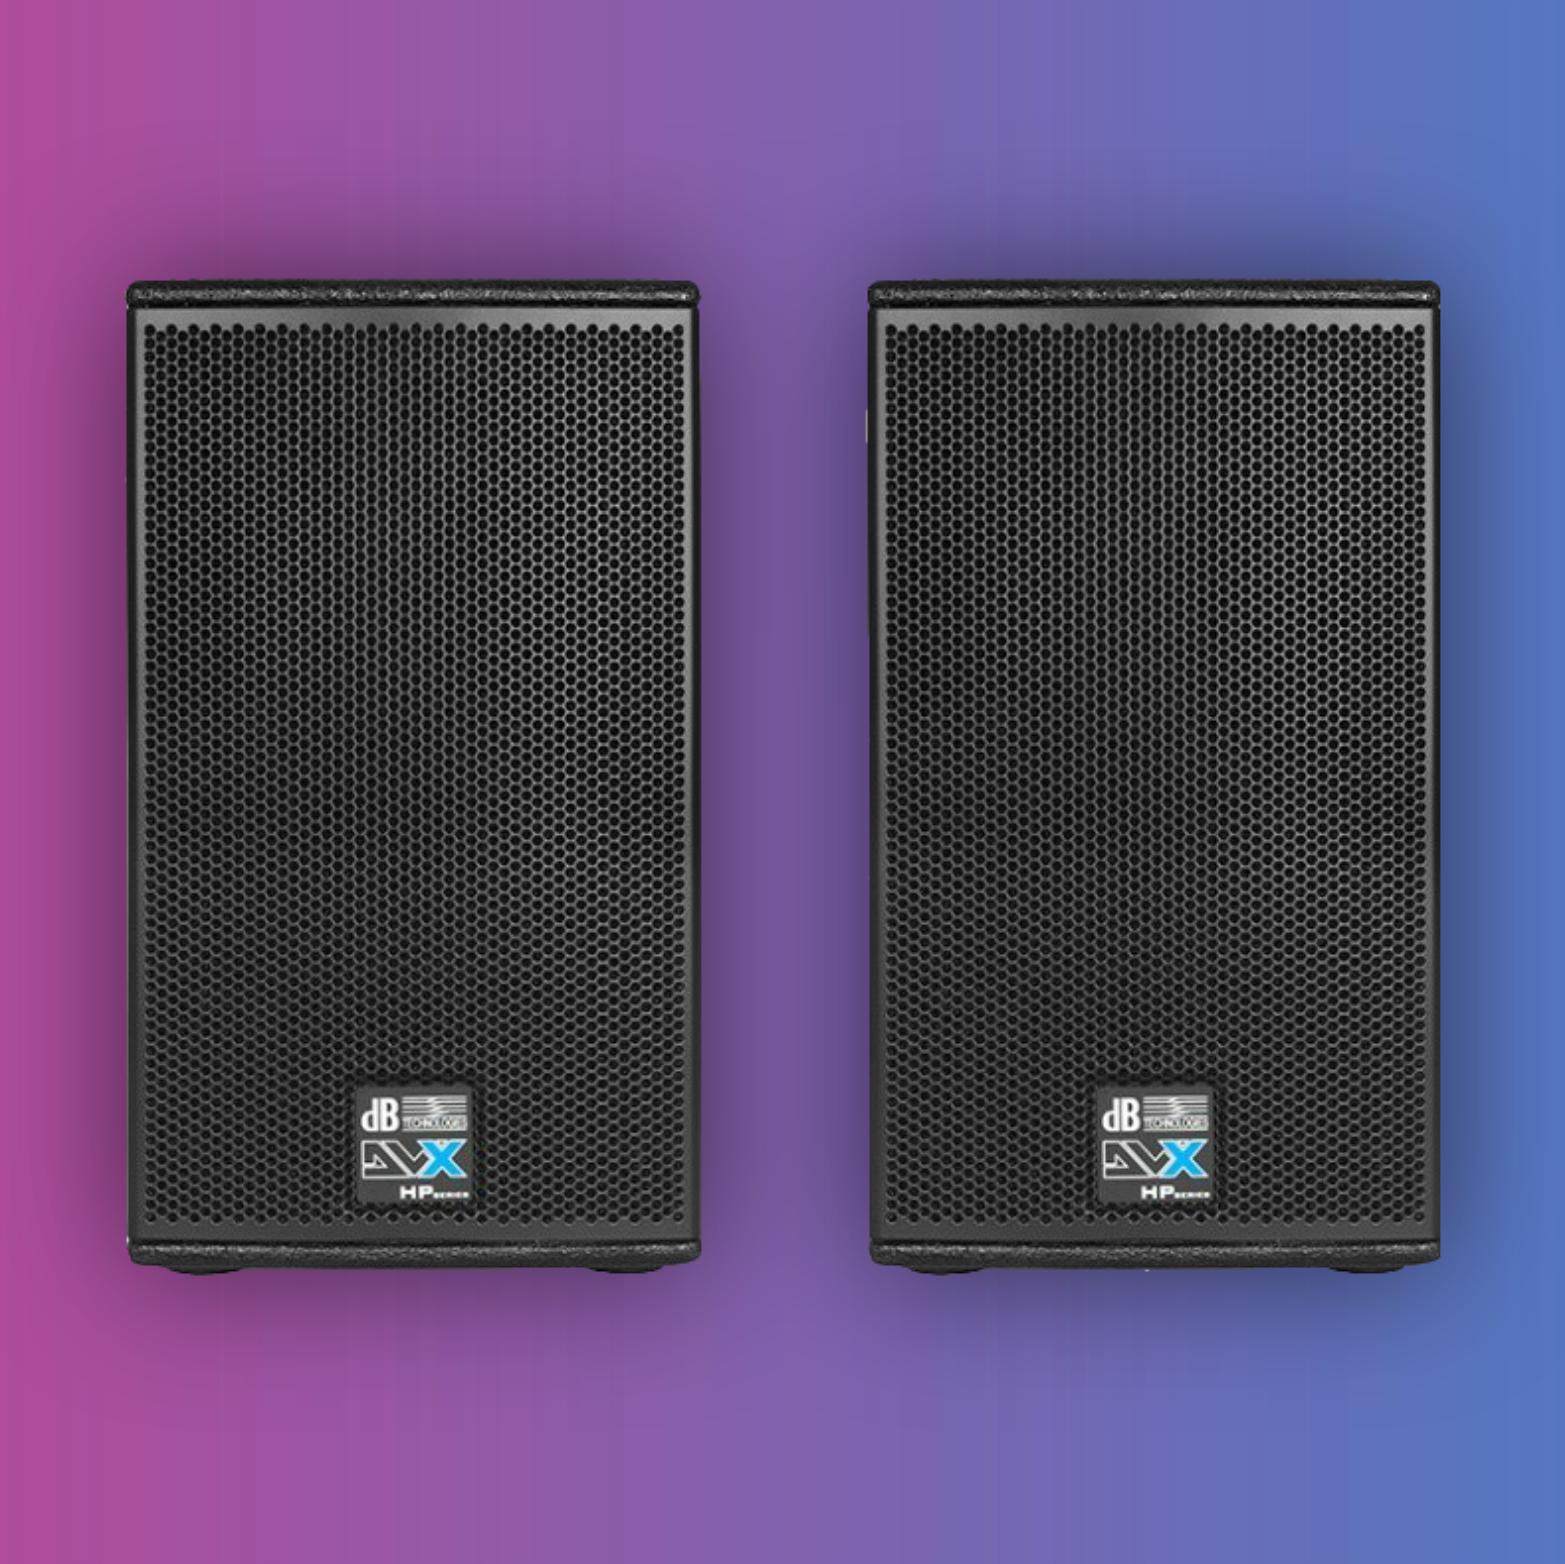 dB Technologies DVX D8 HP: PA-Lautsprecher (Paarpreis, 400W RMS, 2,5cm Hochtöner, 20,32cm Tieftöner, 125dB Max SPL, 90°x70° Horn)